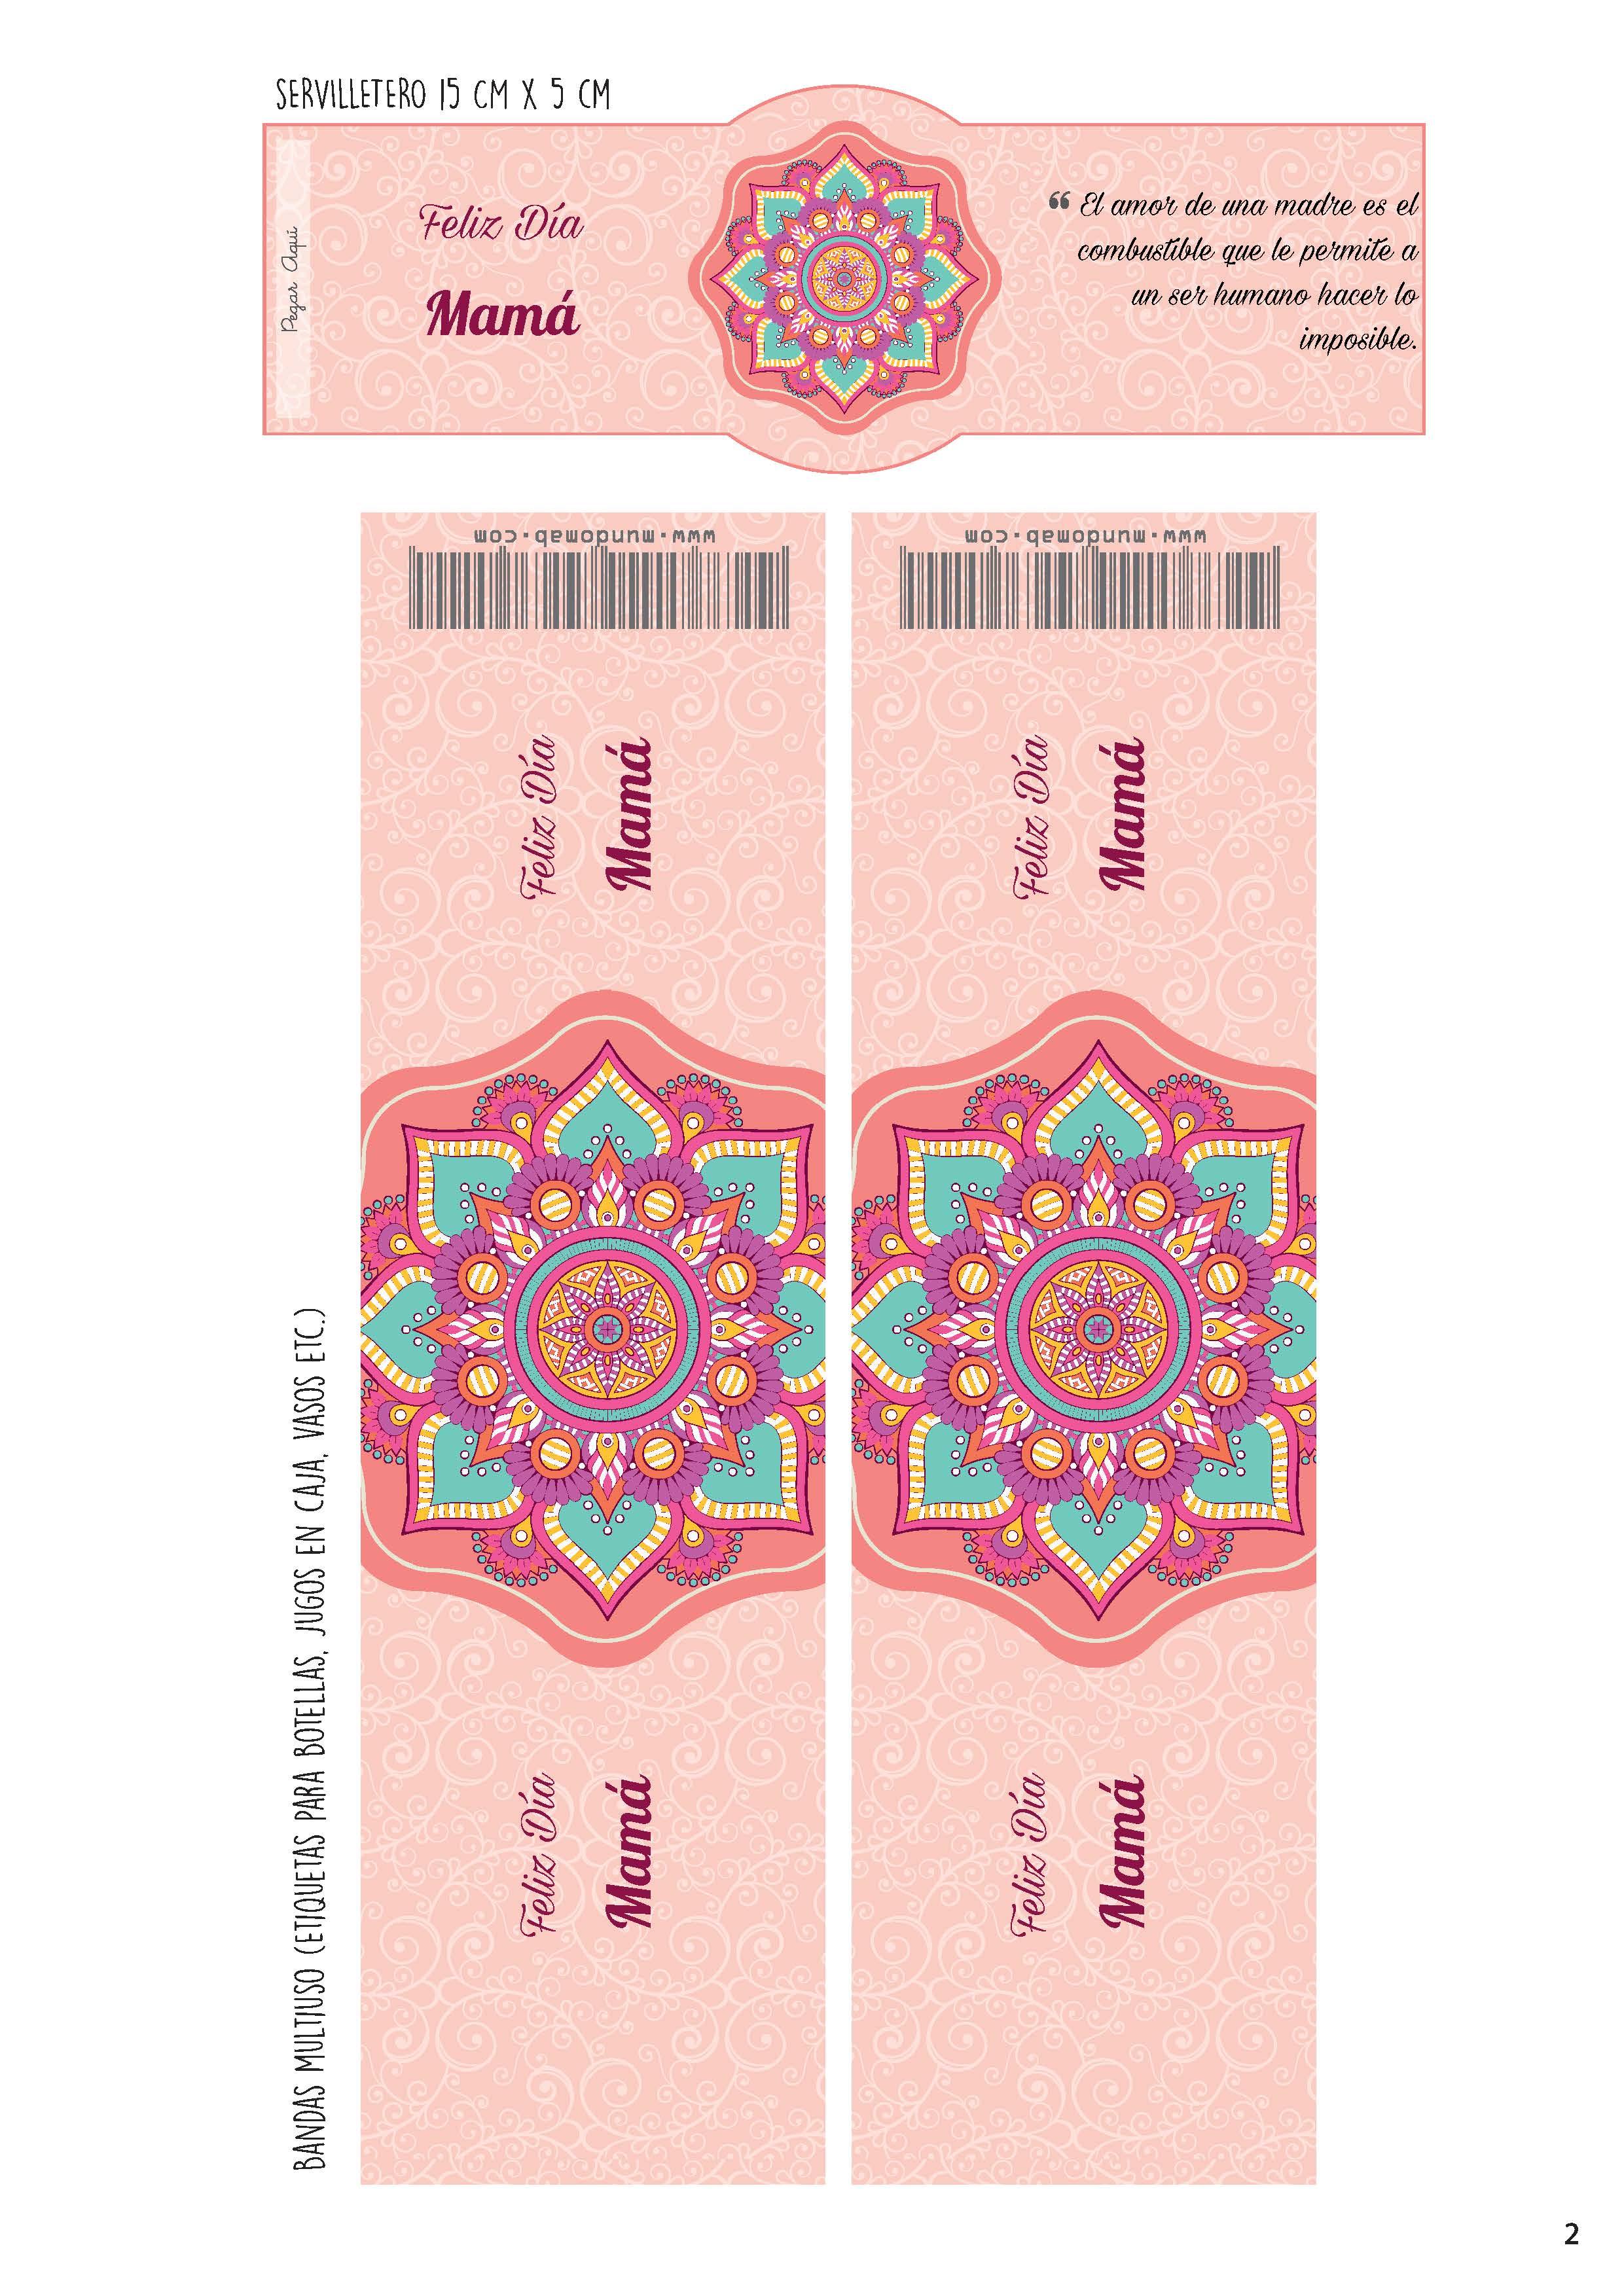 Mundomab Diseño De Kits Imprimibles